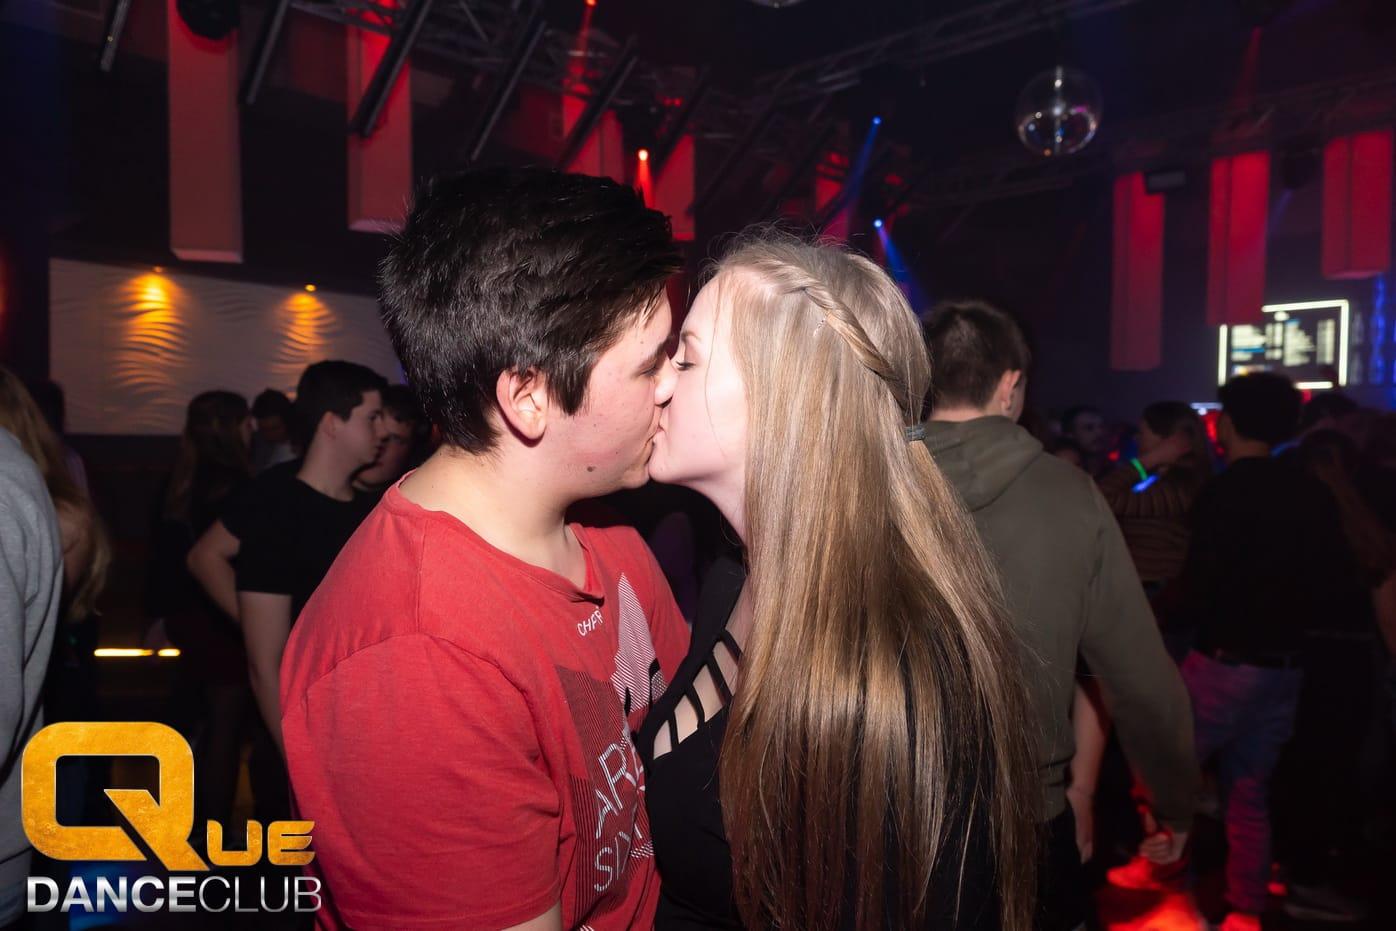 2019_02_15_Que_Danceclub_Secret_Kiss_Nightlife_Scene_Timo_049